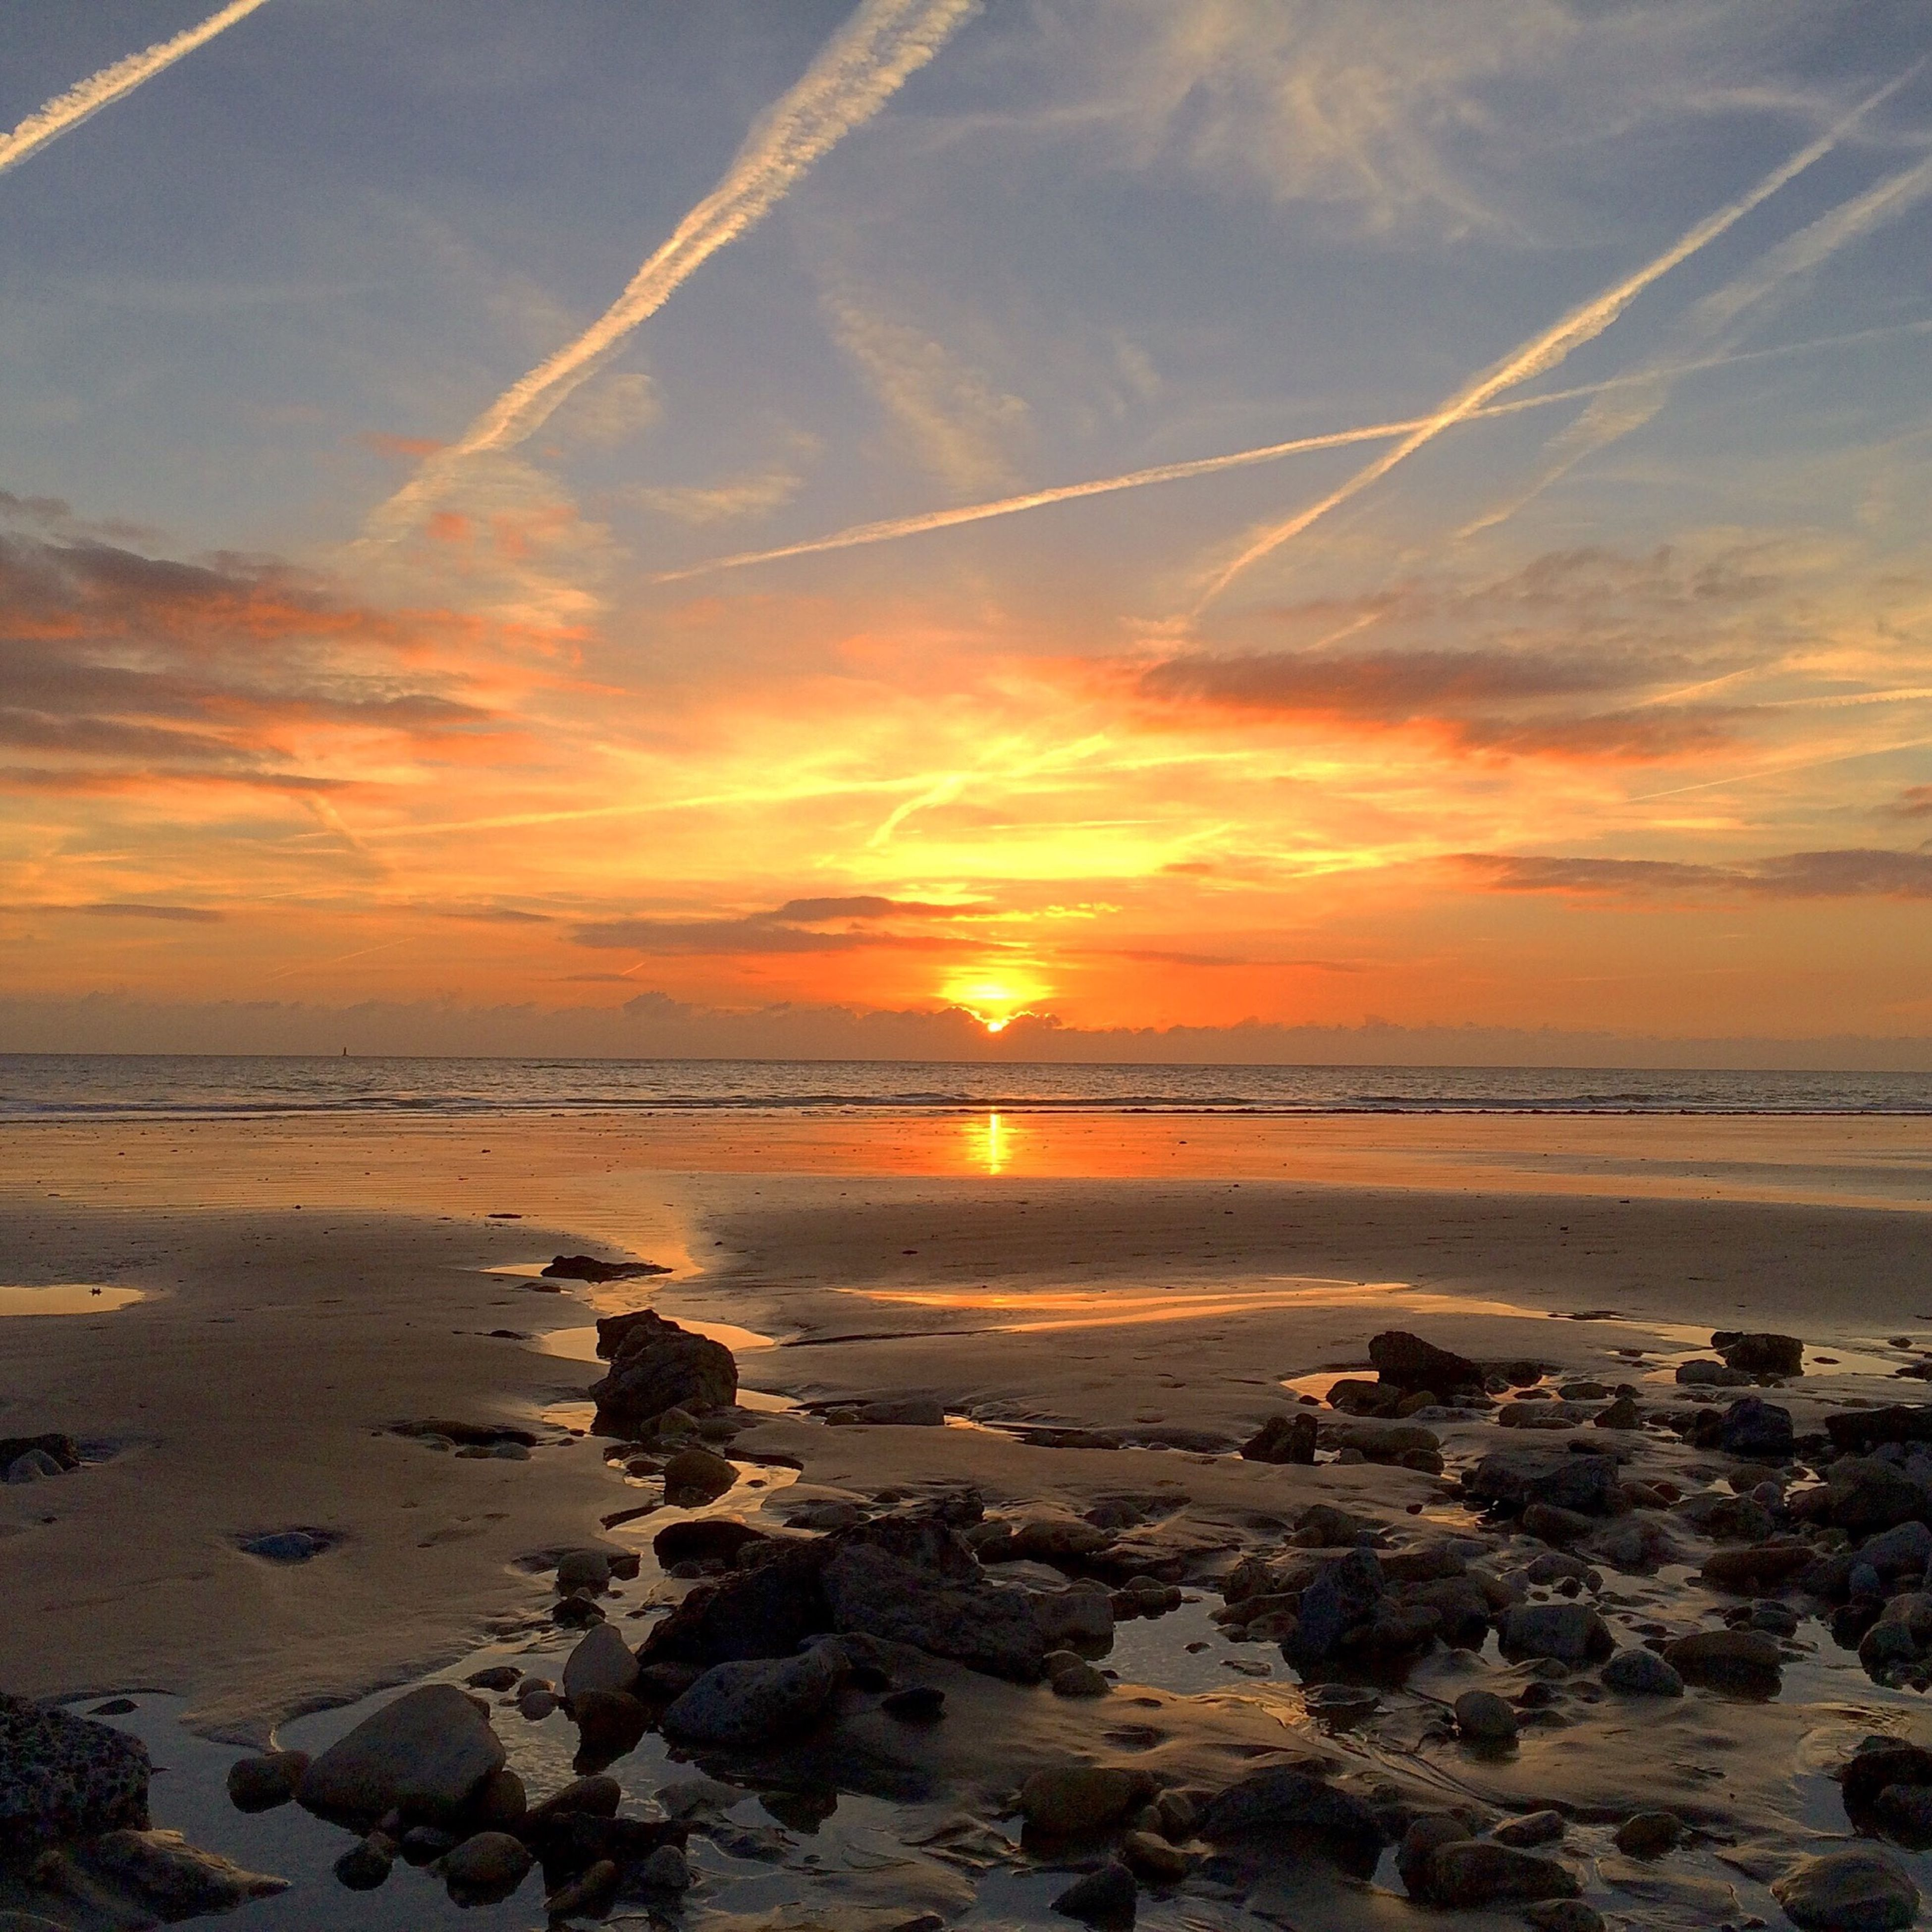 sunset, water, scenics, beach, tranquil scene, sea, beauty in nature, tranquility, sky, shore, sun, horizon over water, orange color, nature, idyllic, cloud - sky, reflection, rock - object, sunlight, non-urban scene